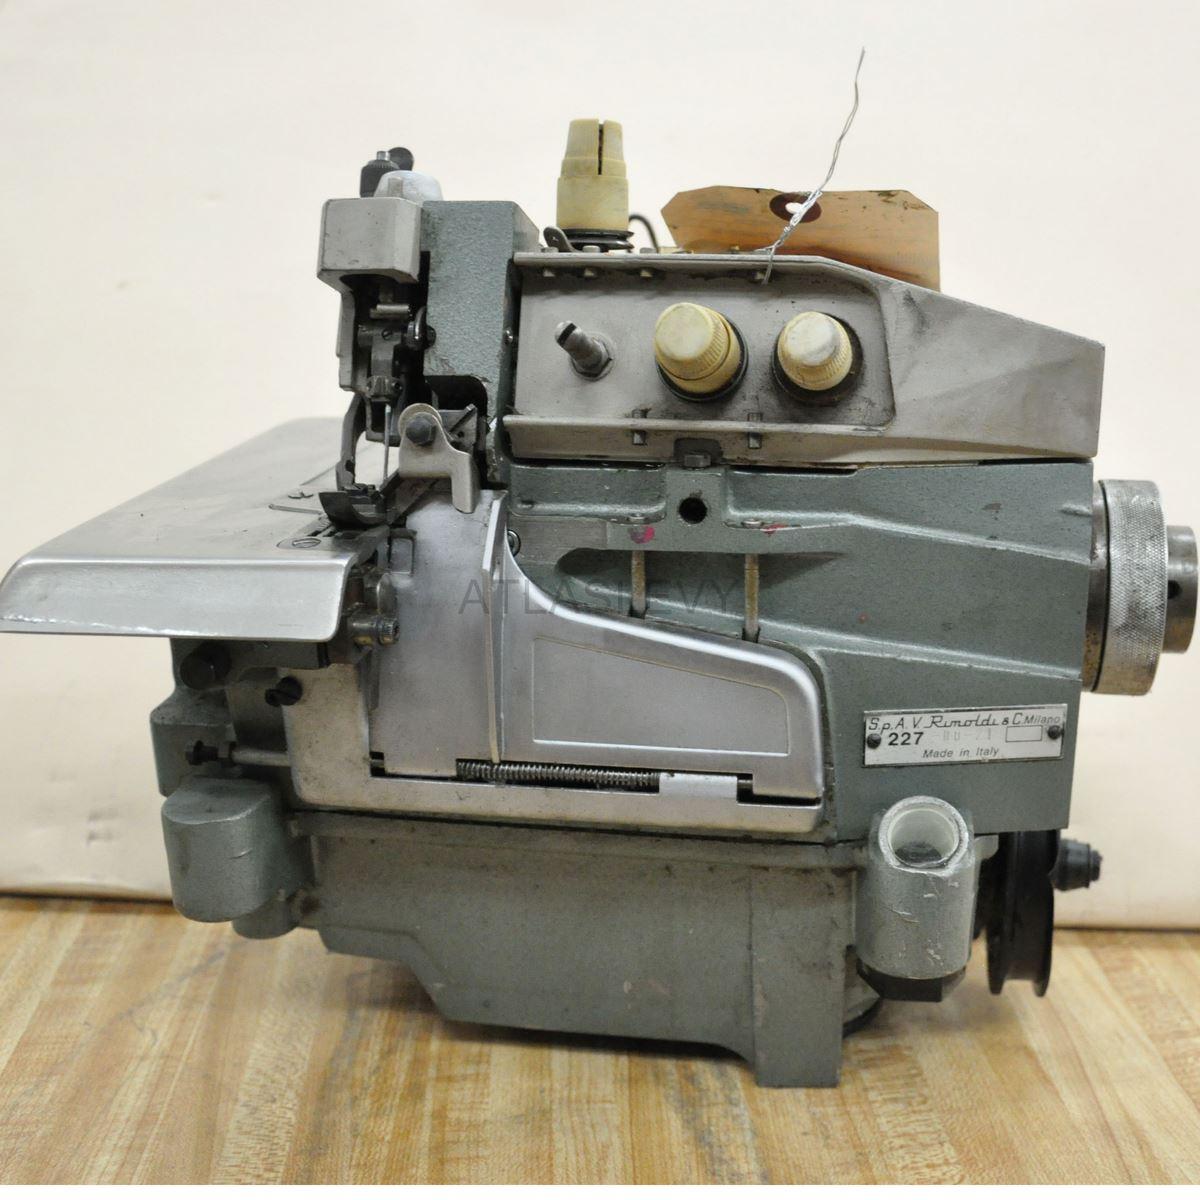 Buy Overlock Sewing Machine Online